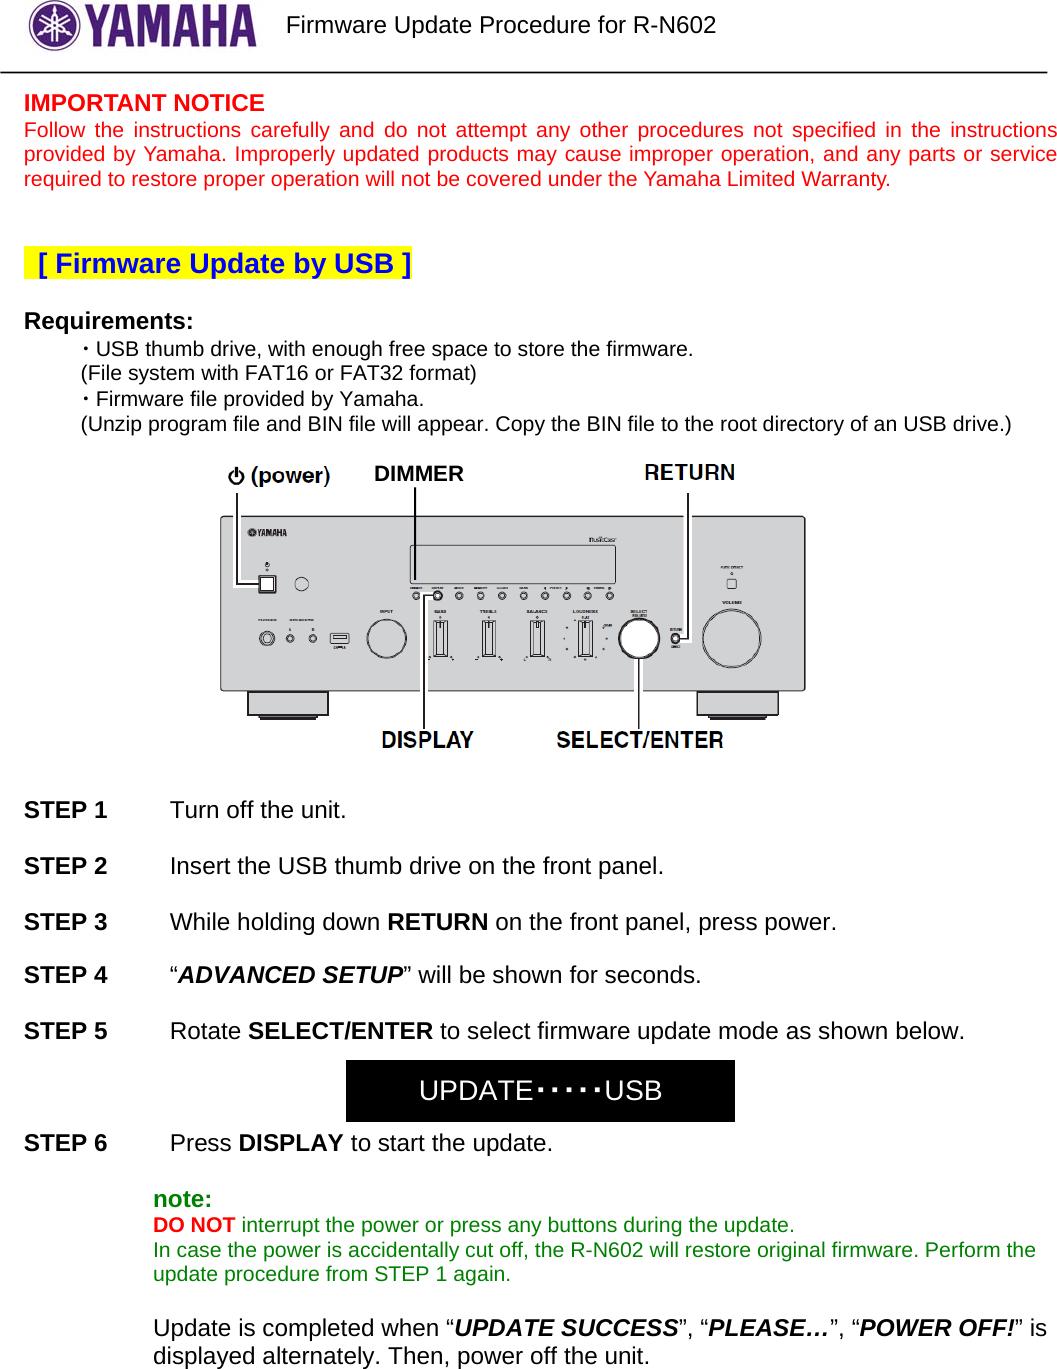 Yamaha R N602 FirmwareUpdate Procedure_ENx Firmware